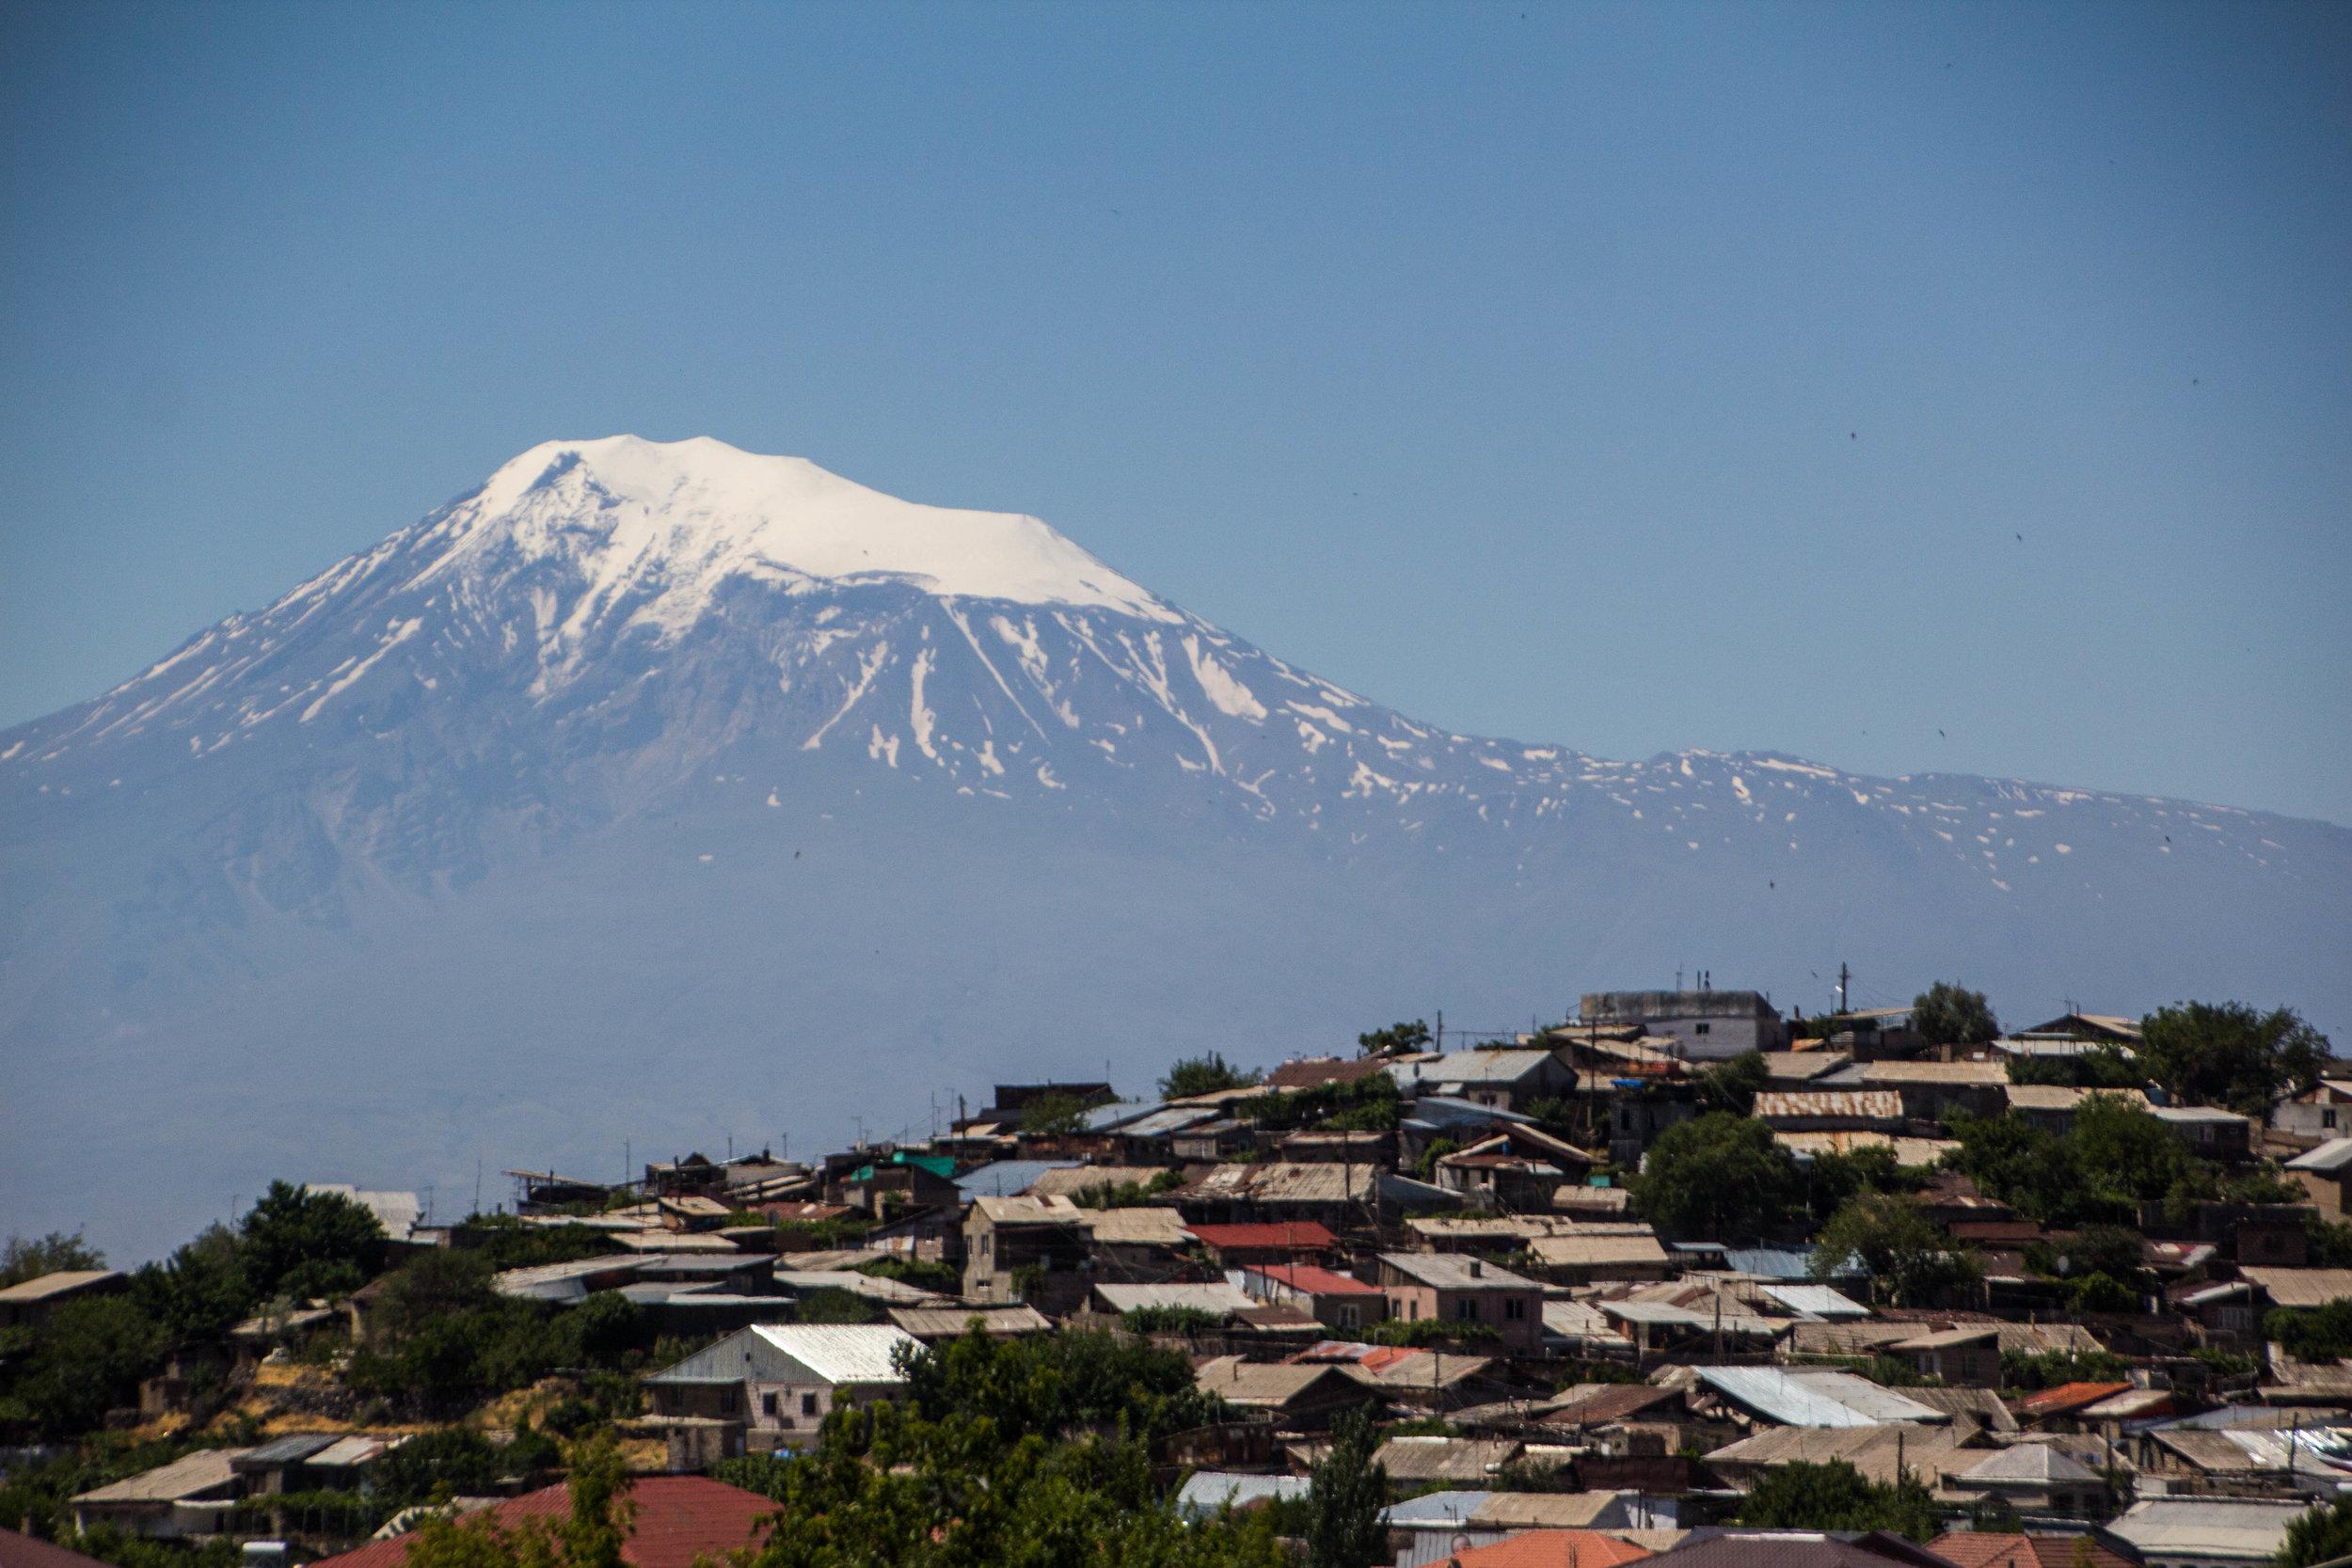 yerevan-armenia-streets-3-24.jpg